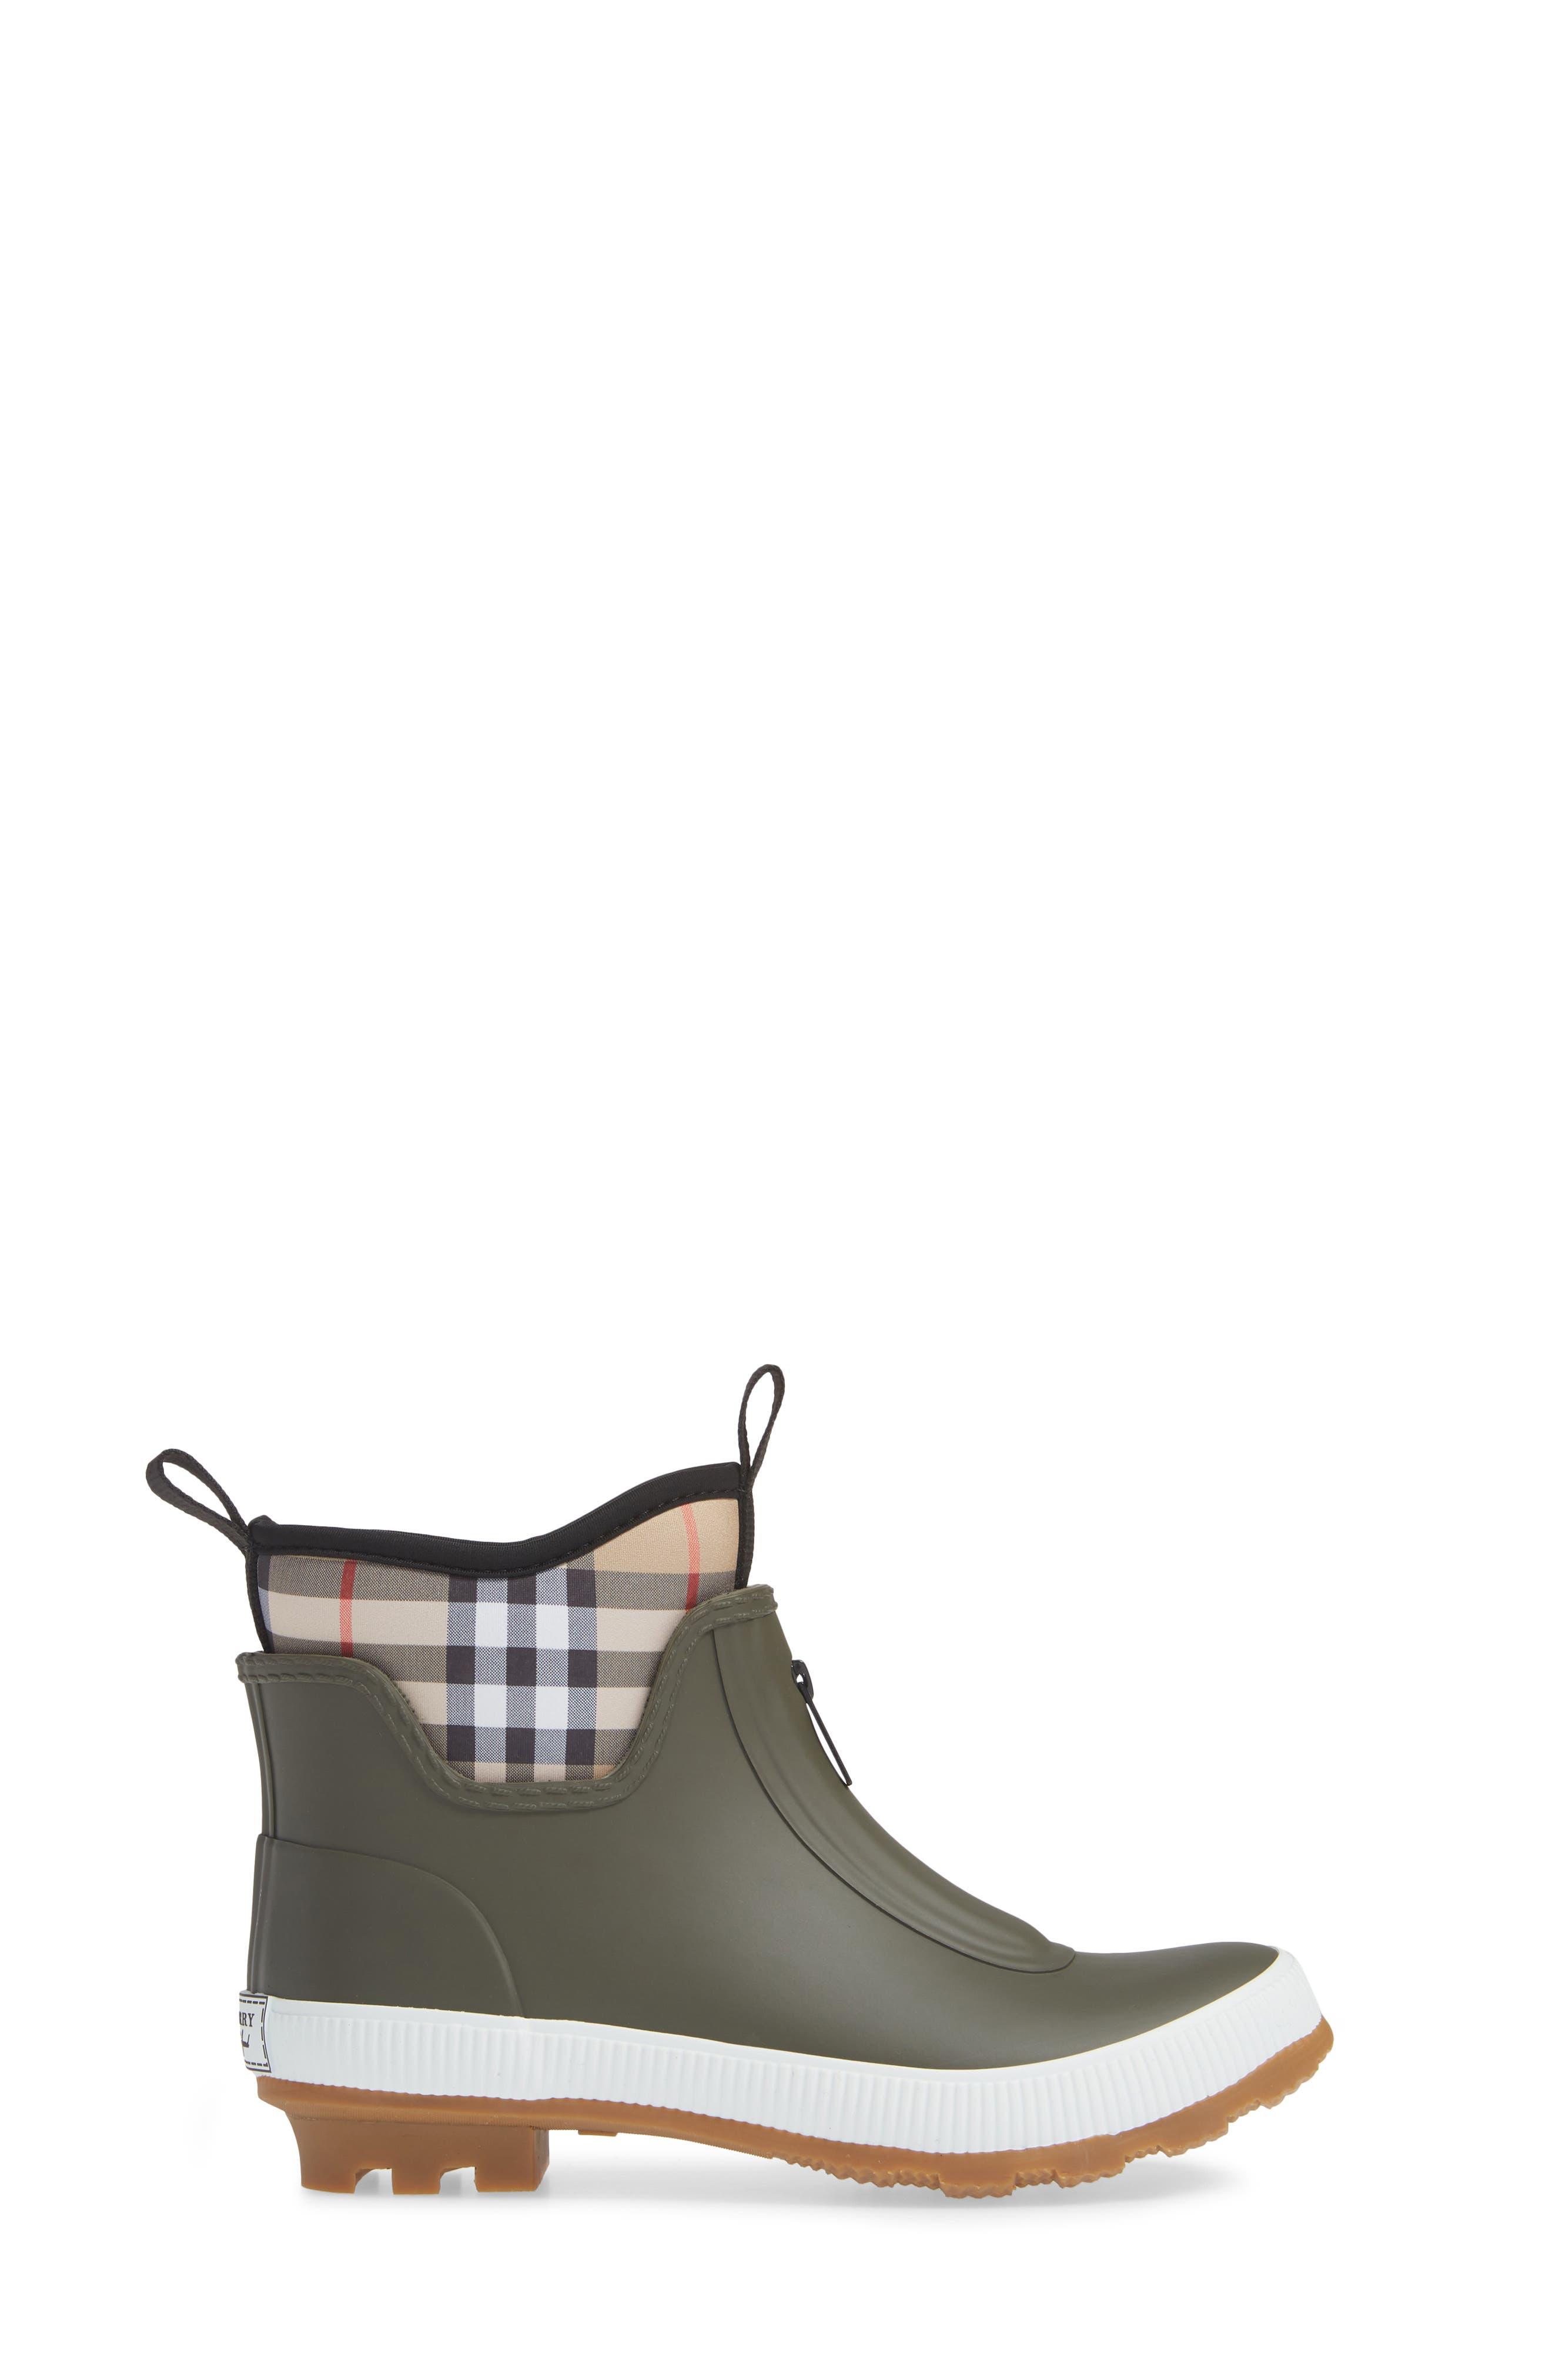 Flinton Rain Boot,                             Alternate thumbnail 3, color,                             MILITARY GREEN